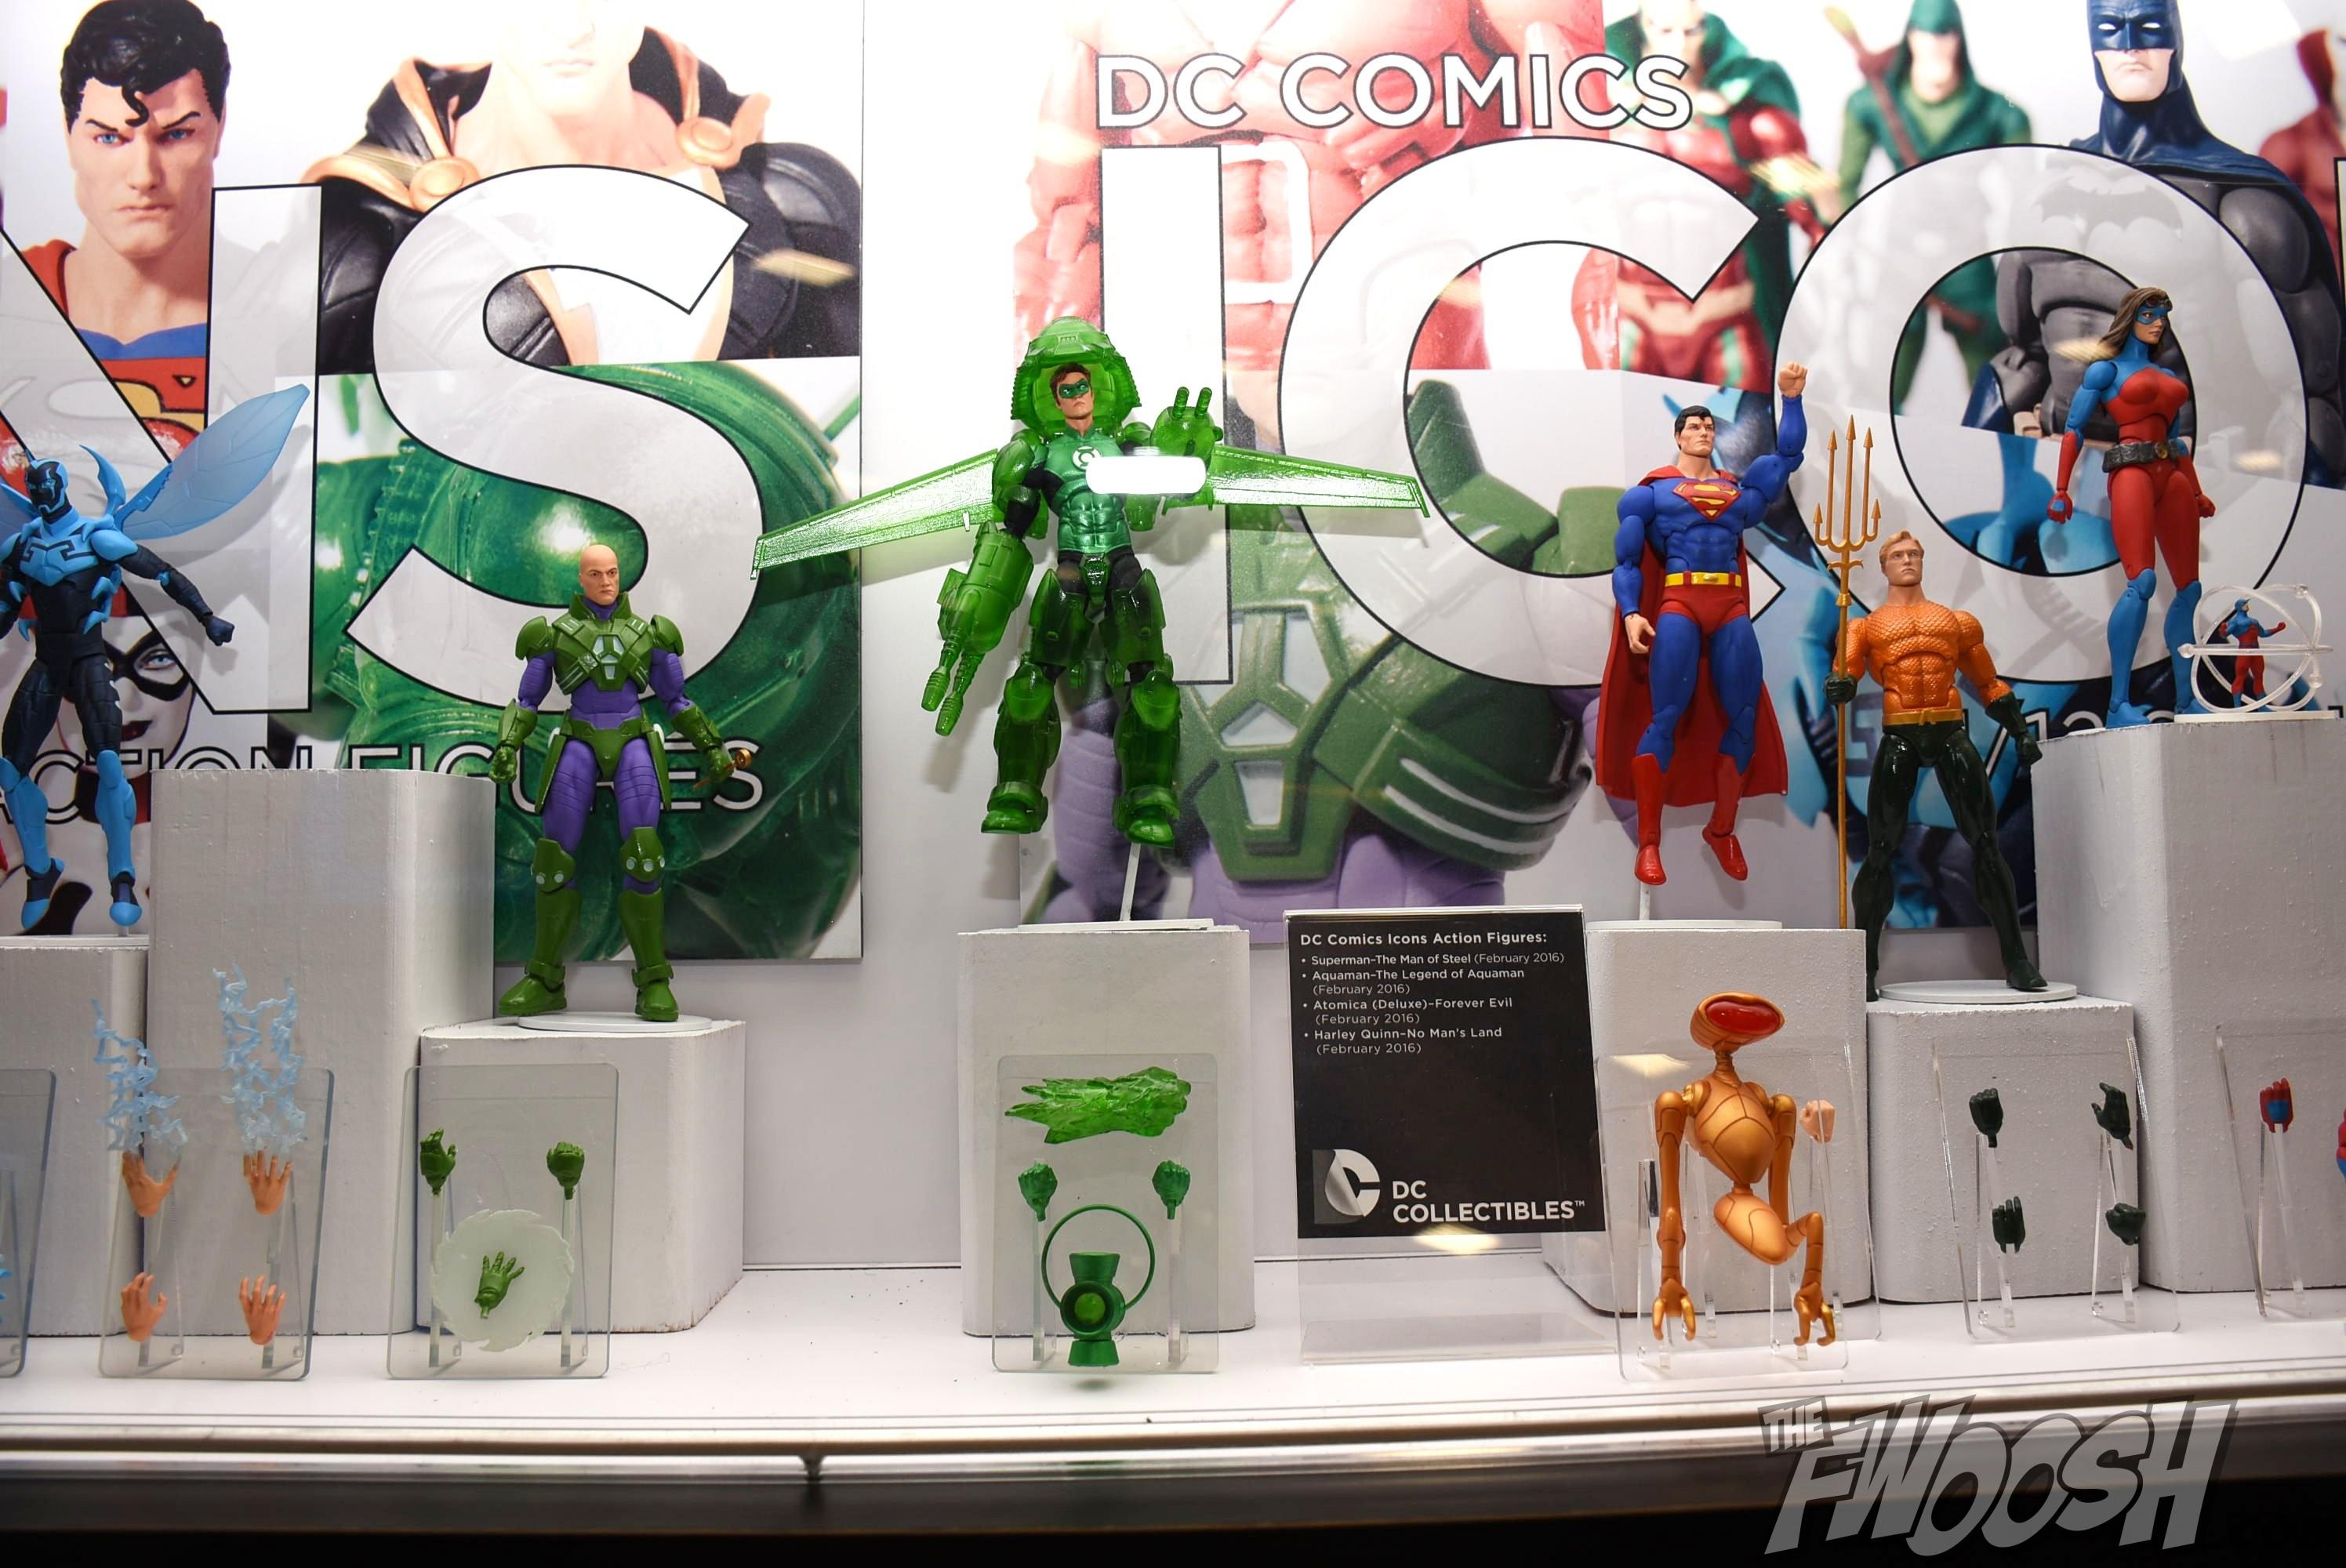 [Action Figures] Todo sobre Action Figures, Hot Toys, Sideshows - Página 5 SDCC-2015-DC-Collectibles_08